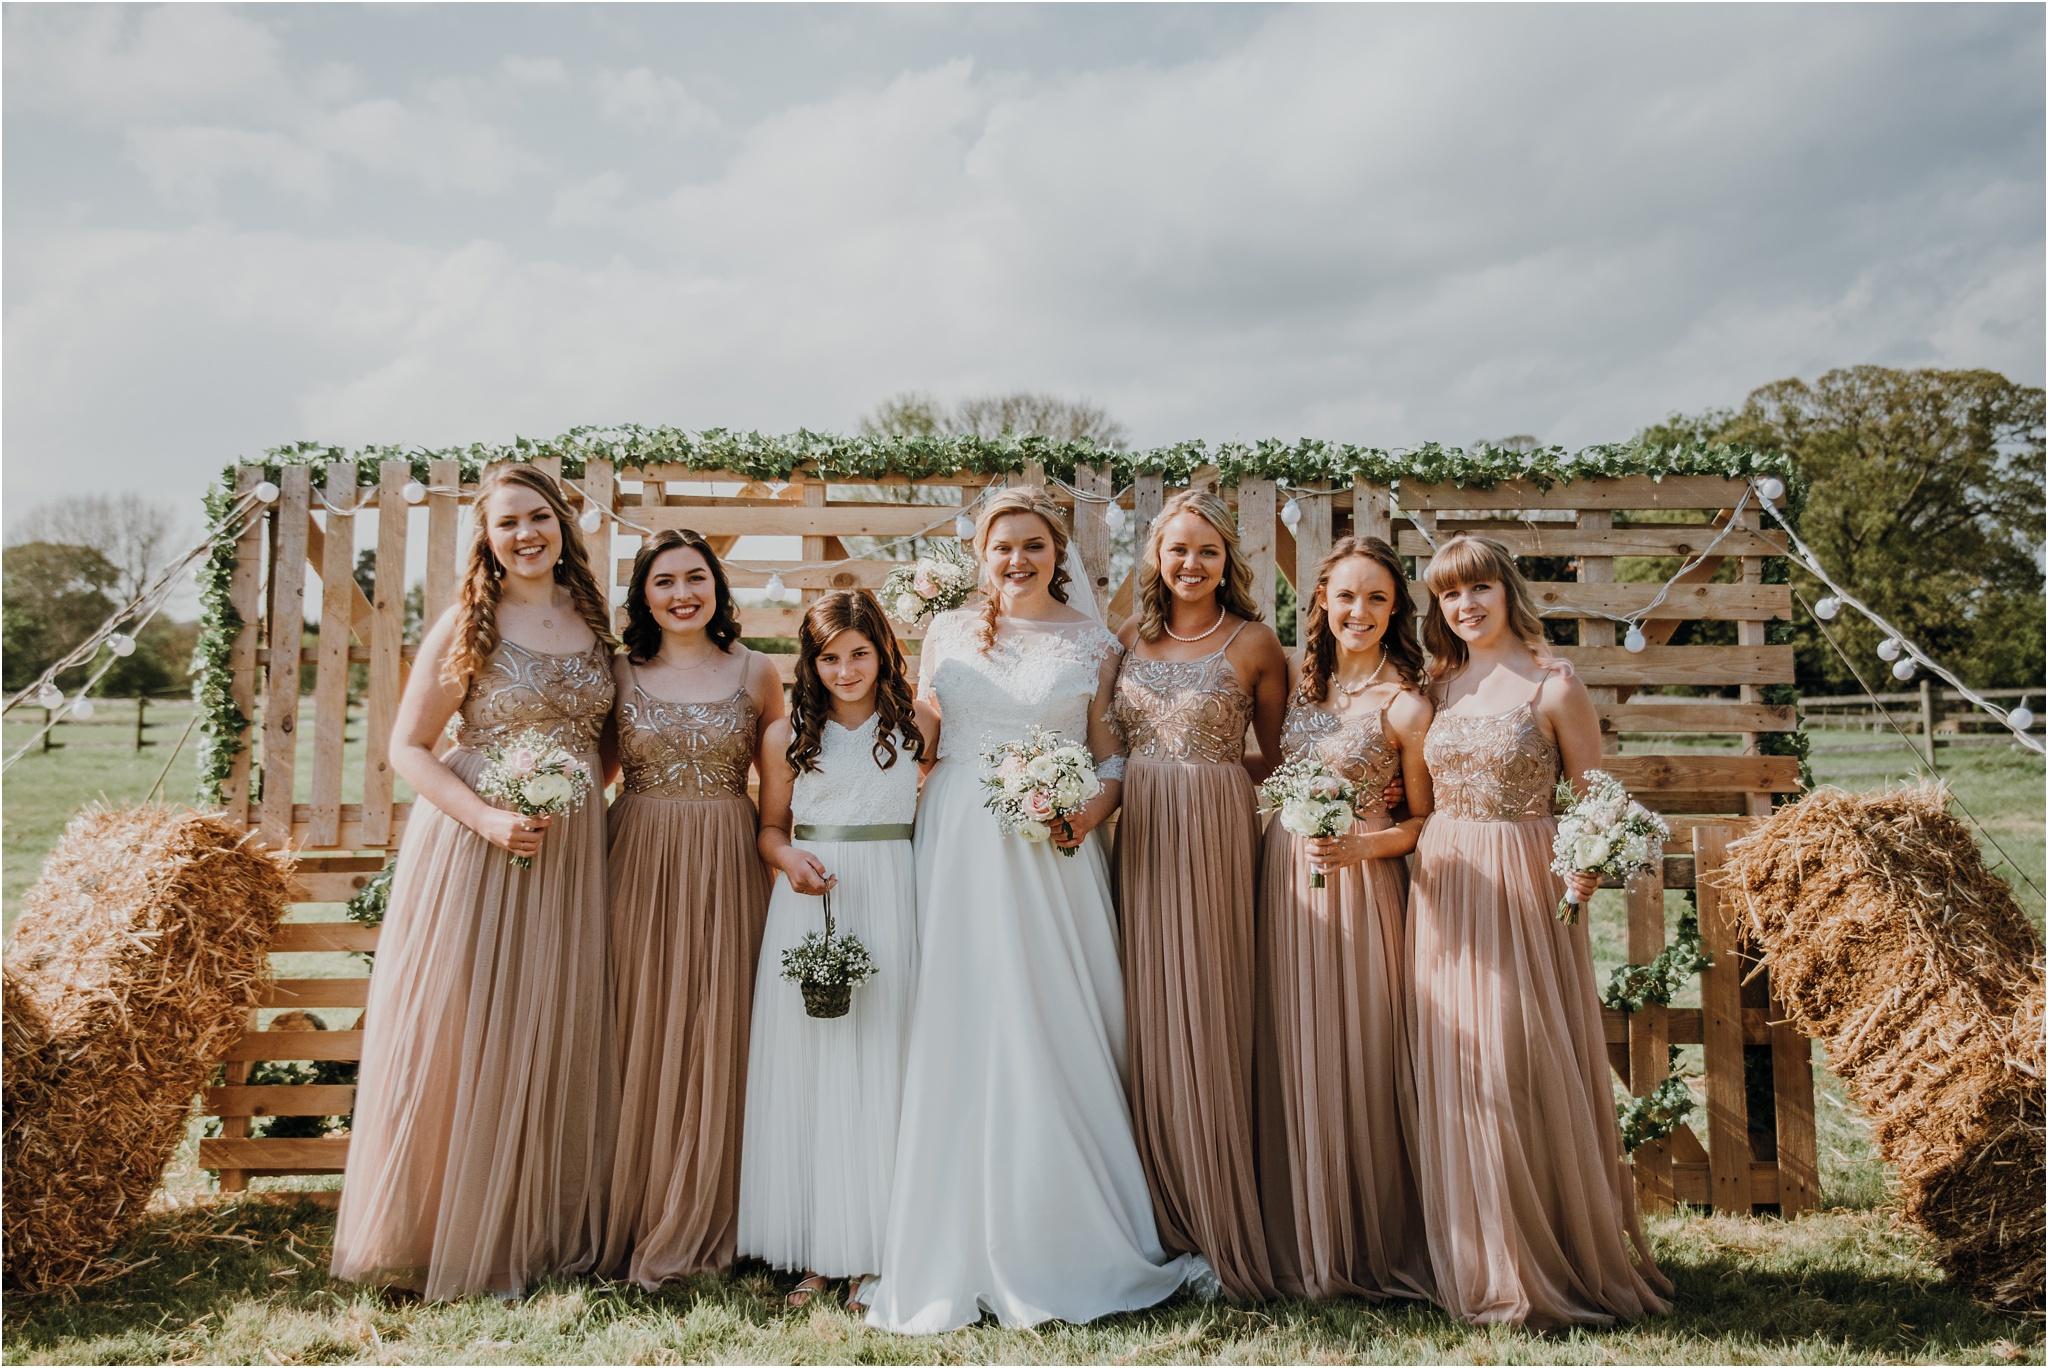 Outdoor-country-wedding-Edinburgh-photographer__0100.jpg